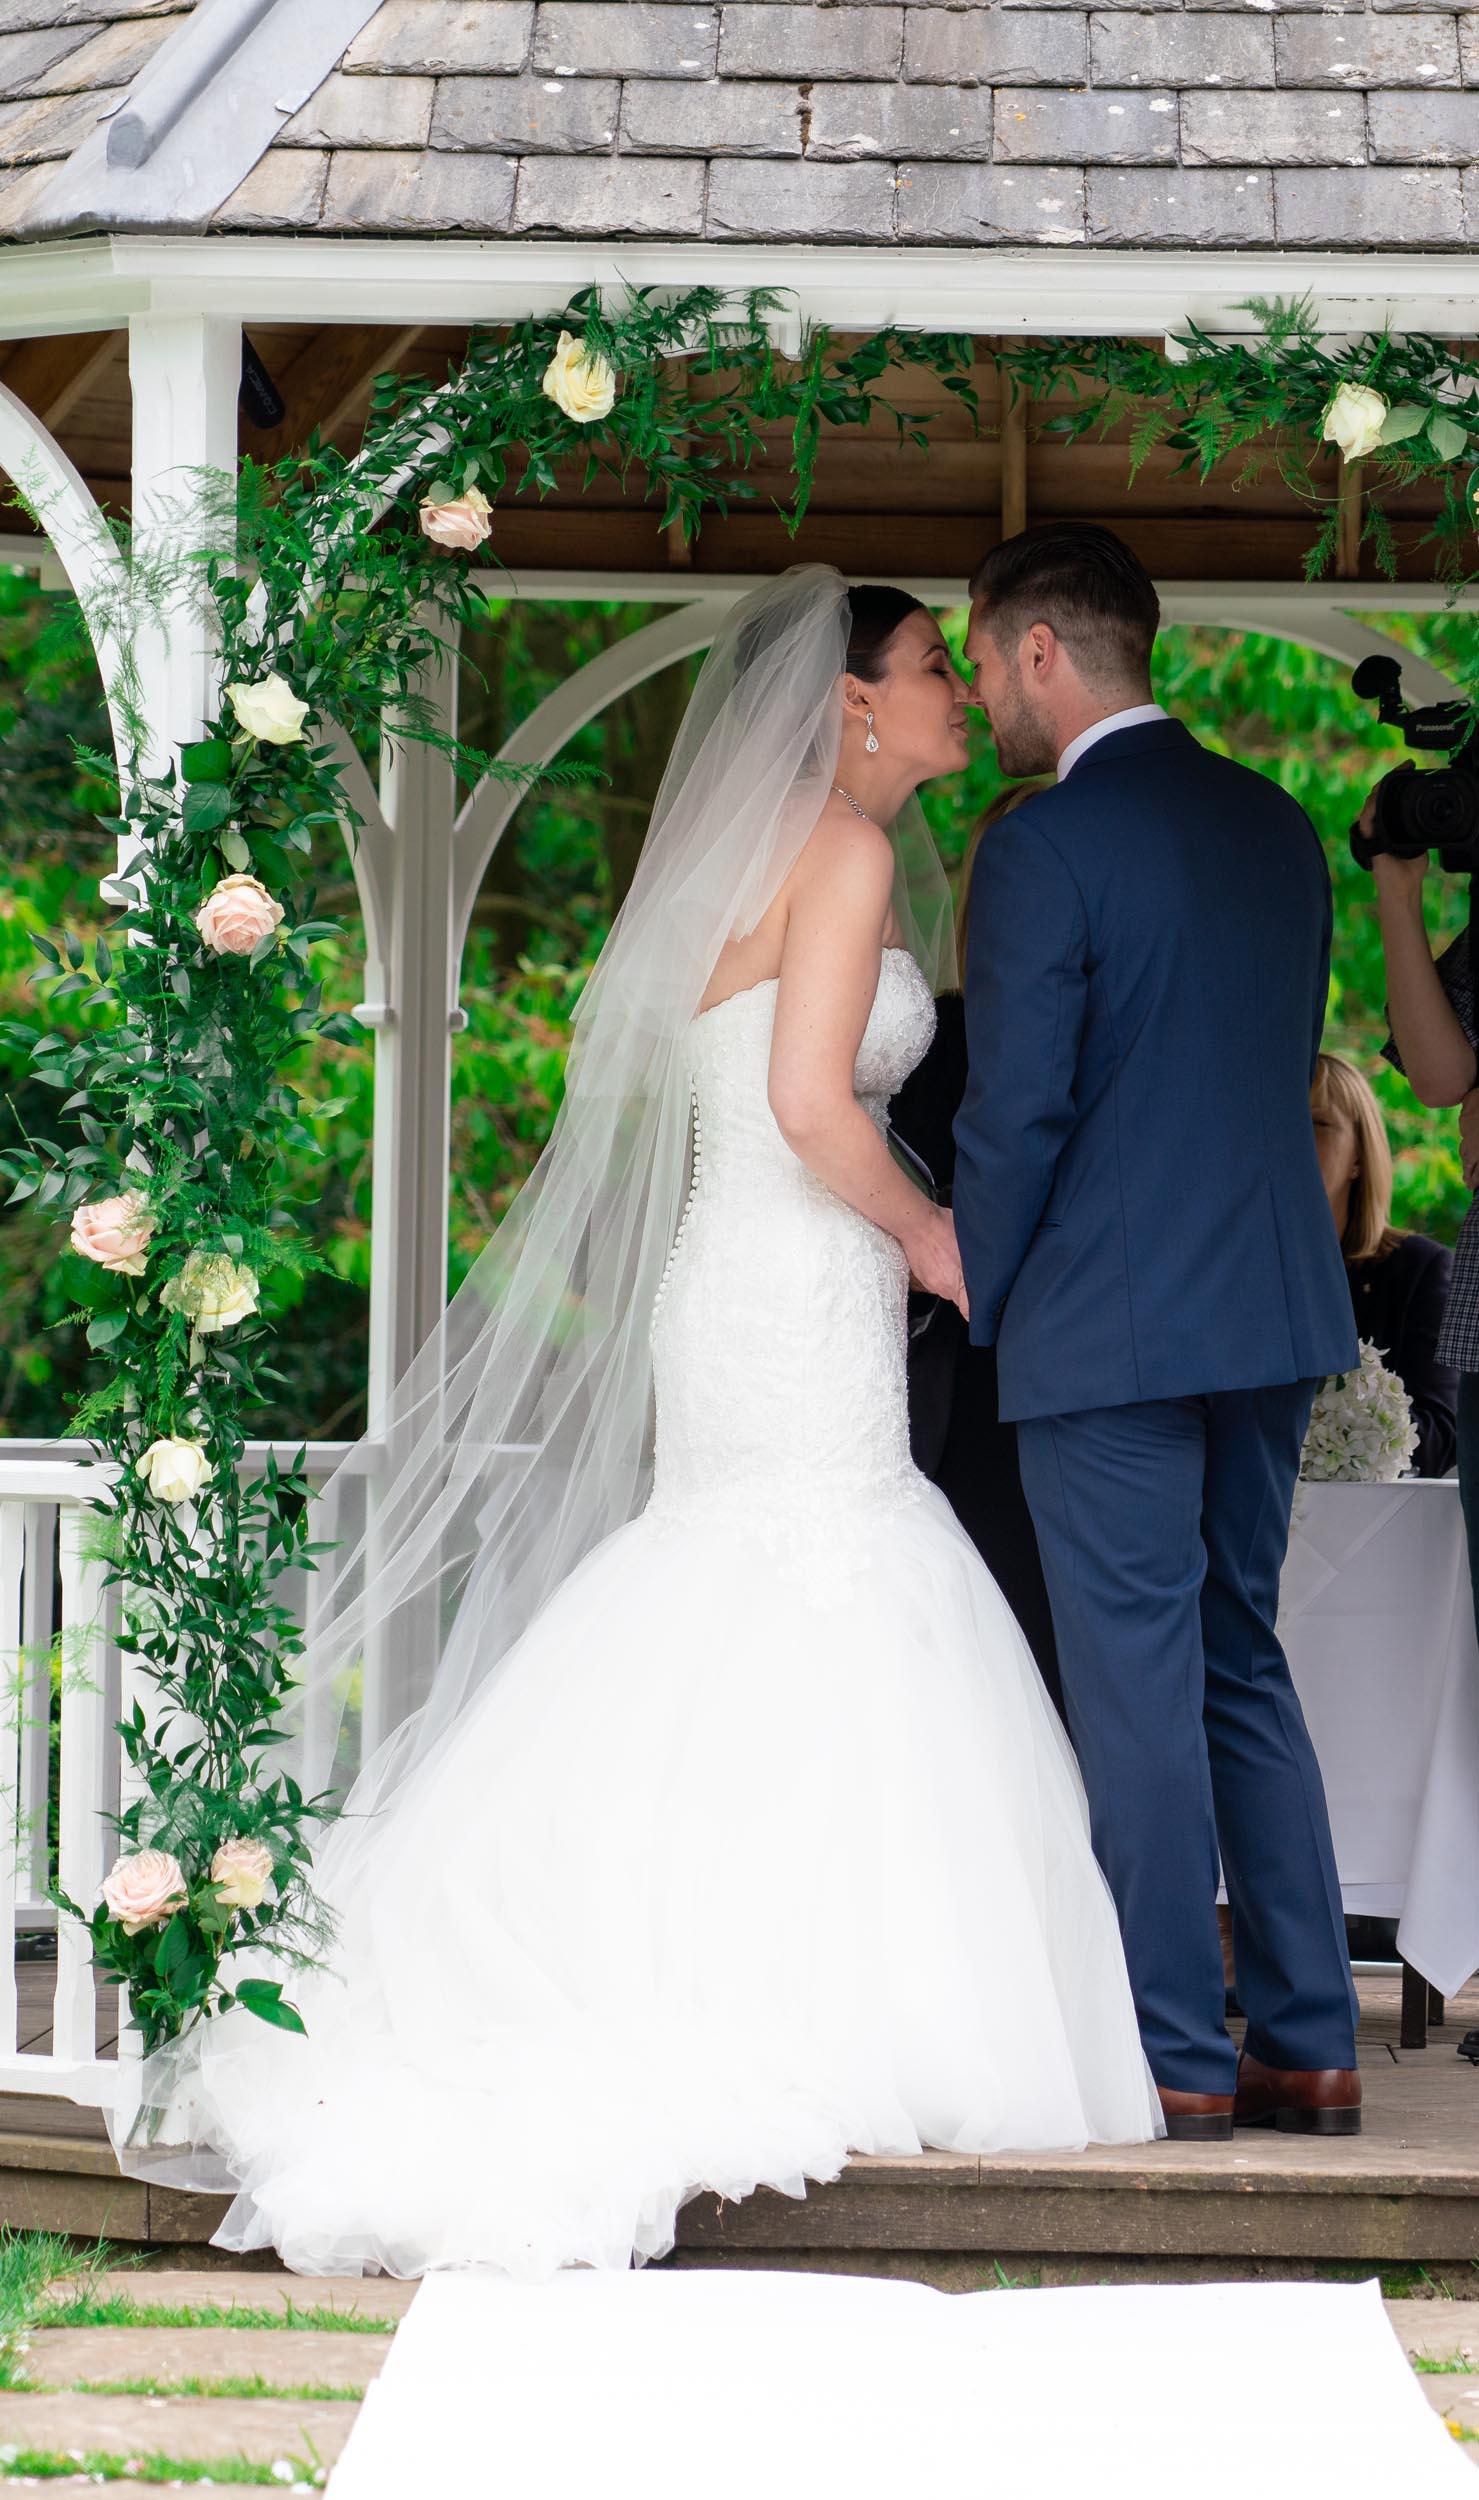 Wedding Ceremony Rowhill Grange 172.jpg